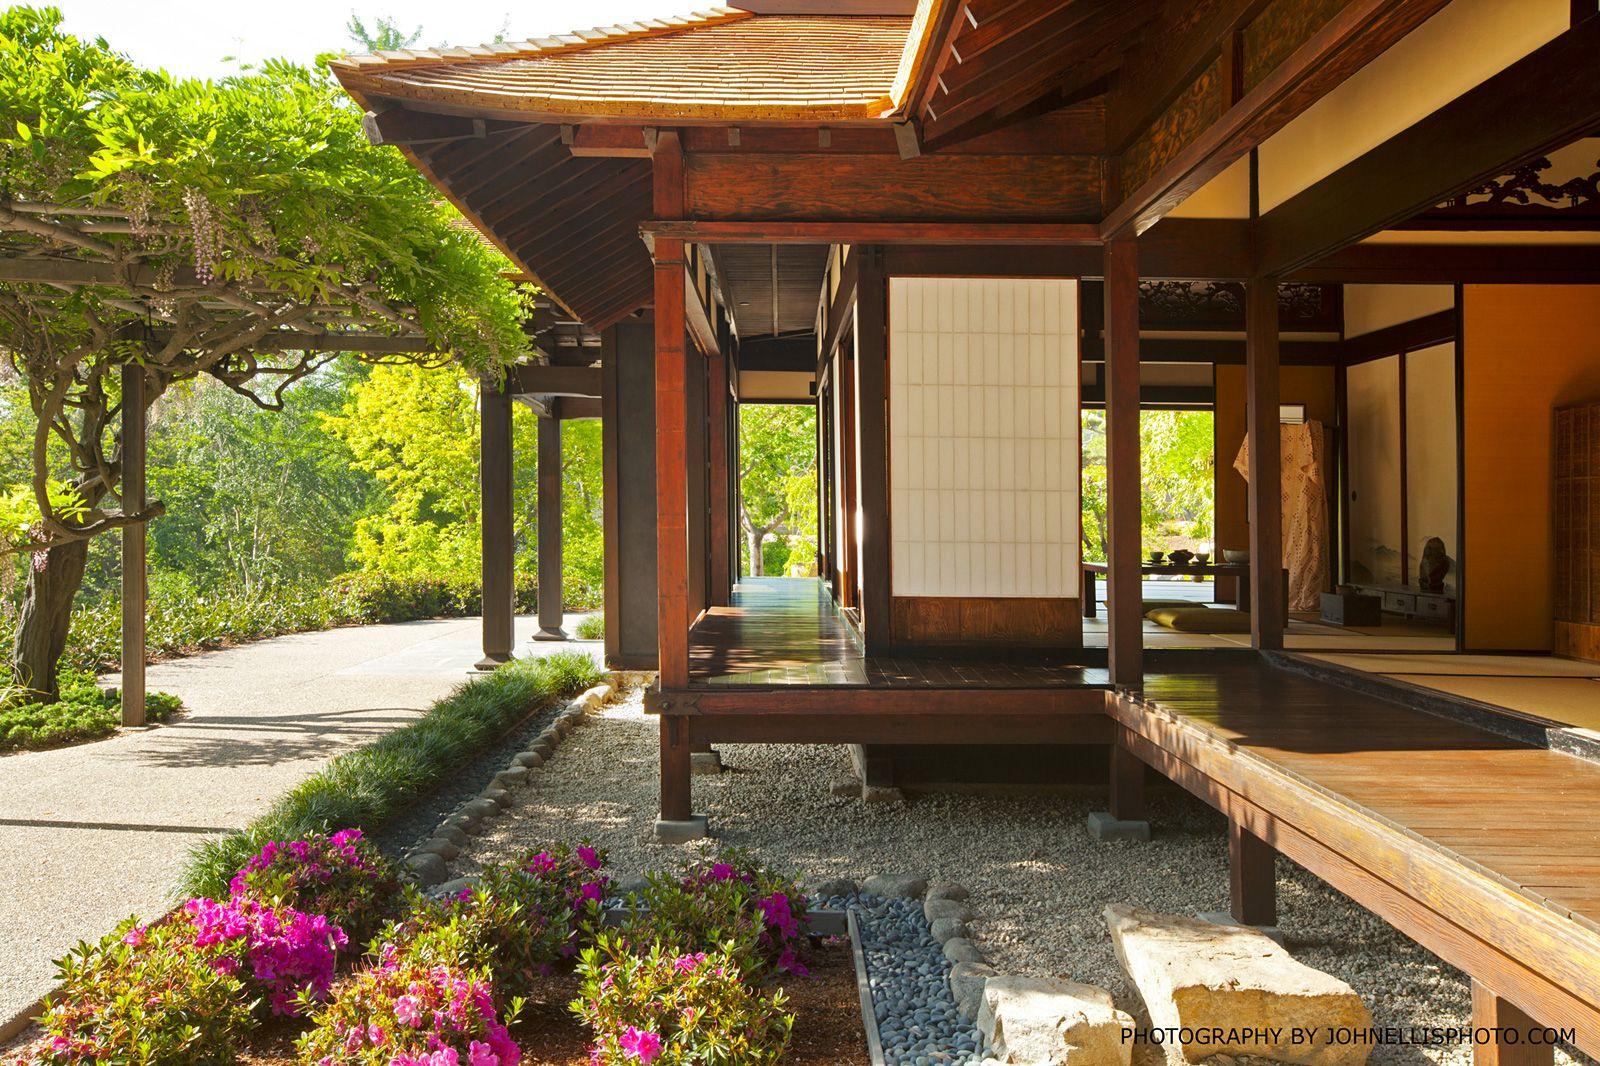 Http Www Bustler Net Images News 2013 La Architectural Awards 23 Jpg Casas Tradicionales Casa Tradicional Japonesa Casas En Japon